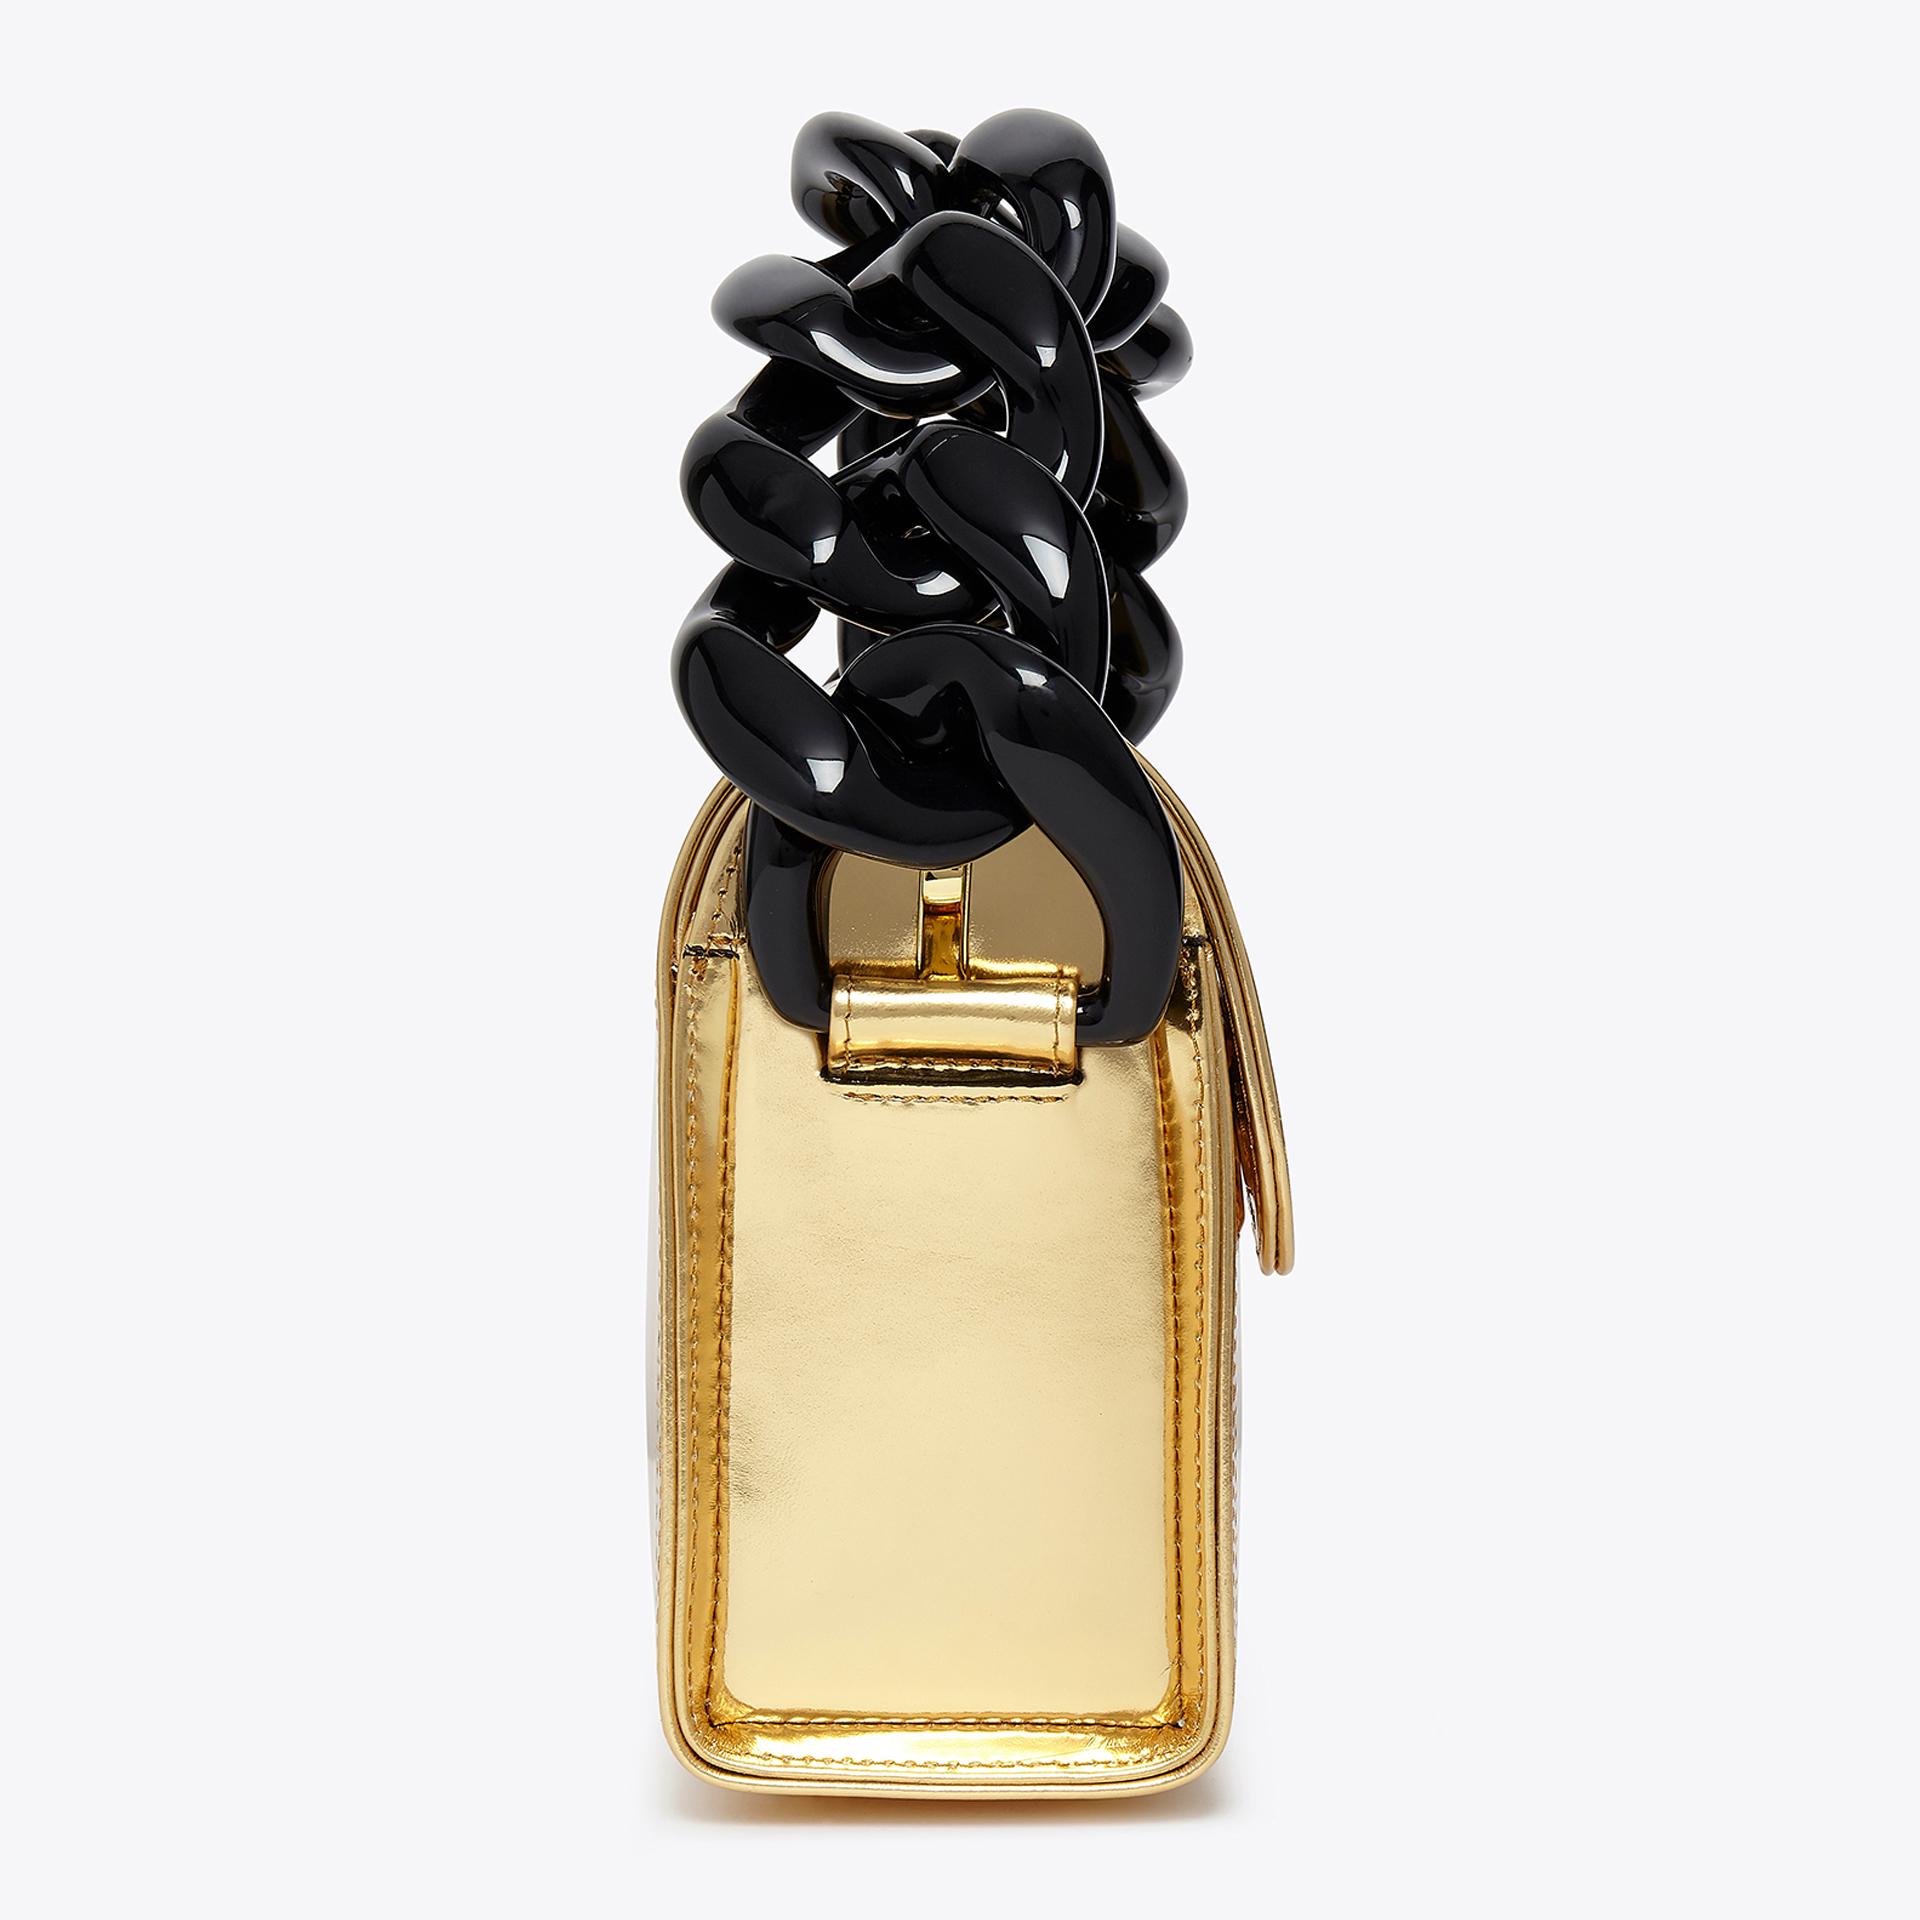 gold handbag with a black handle